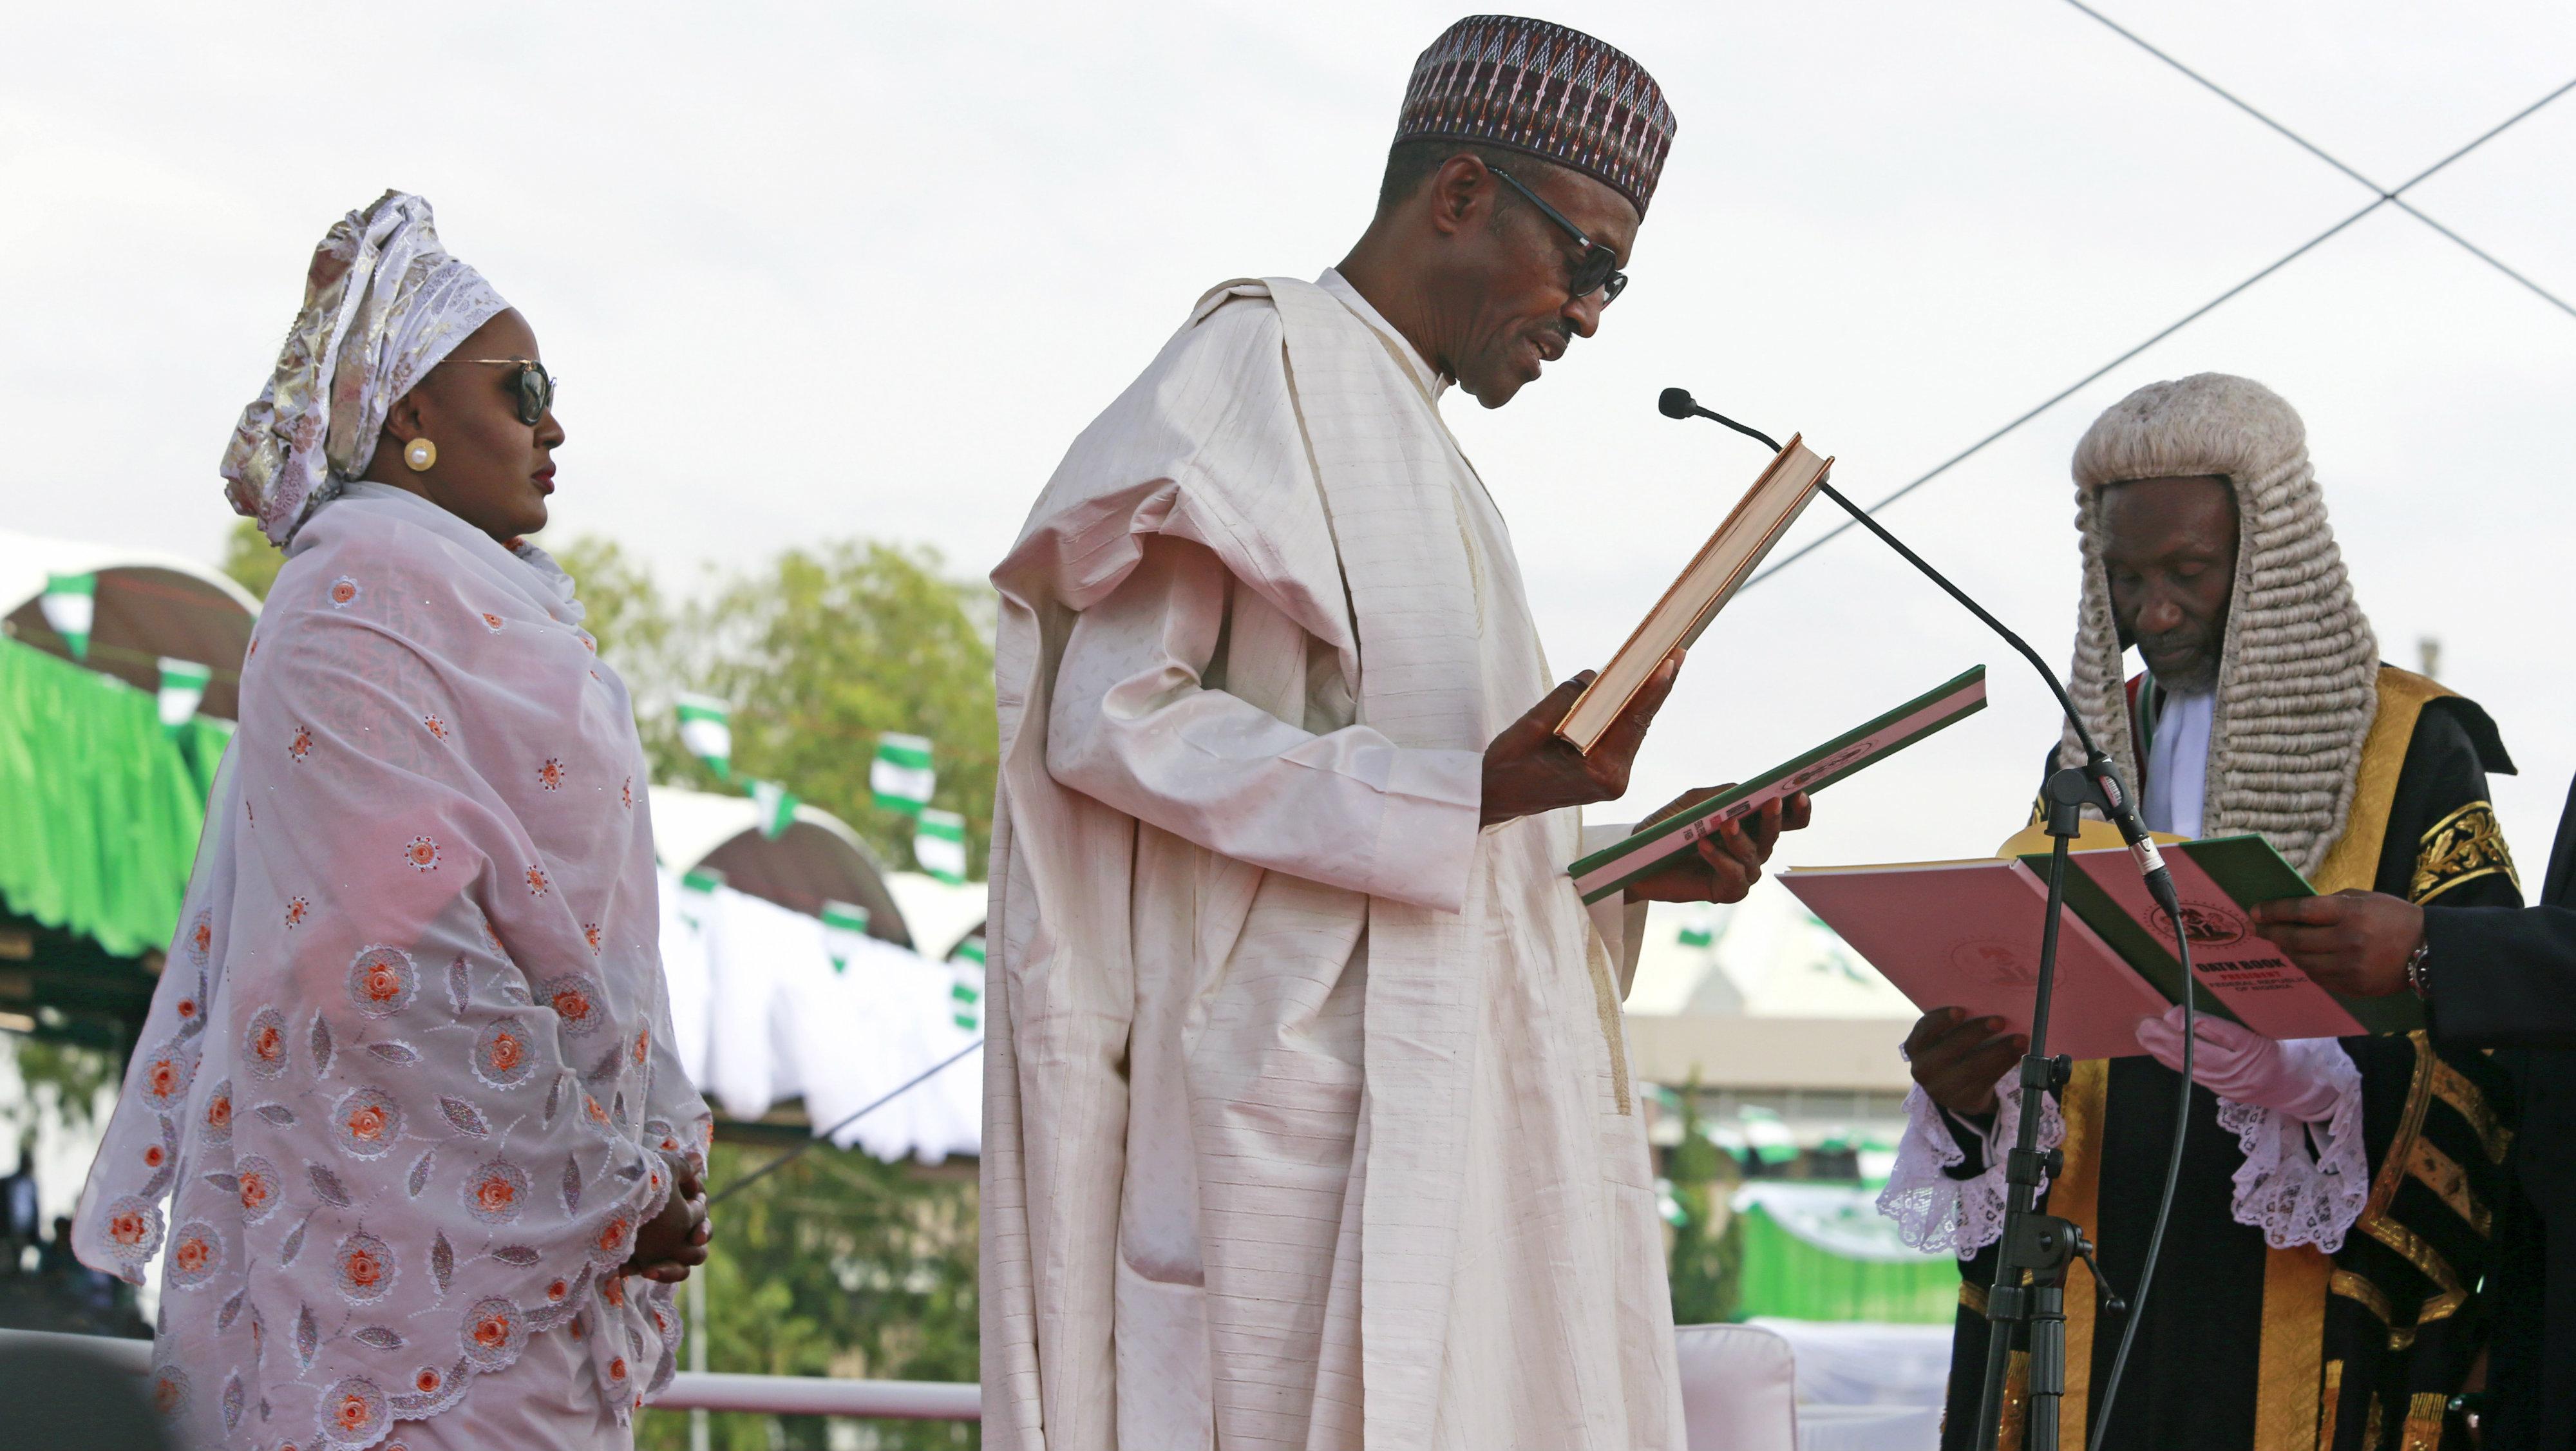 Chief Justice of Nigeria Mahmud Mohammed swears in Muhammadu Buhari (C) as Nigeria's president while Buhari's wife Aisha looks on at Eagle Square in Abuja, Nigeria May 29, 2015.